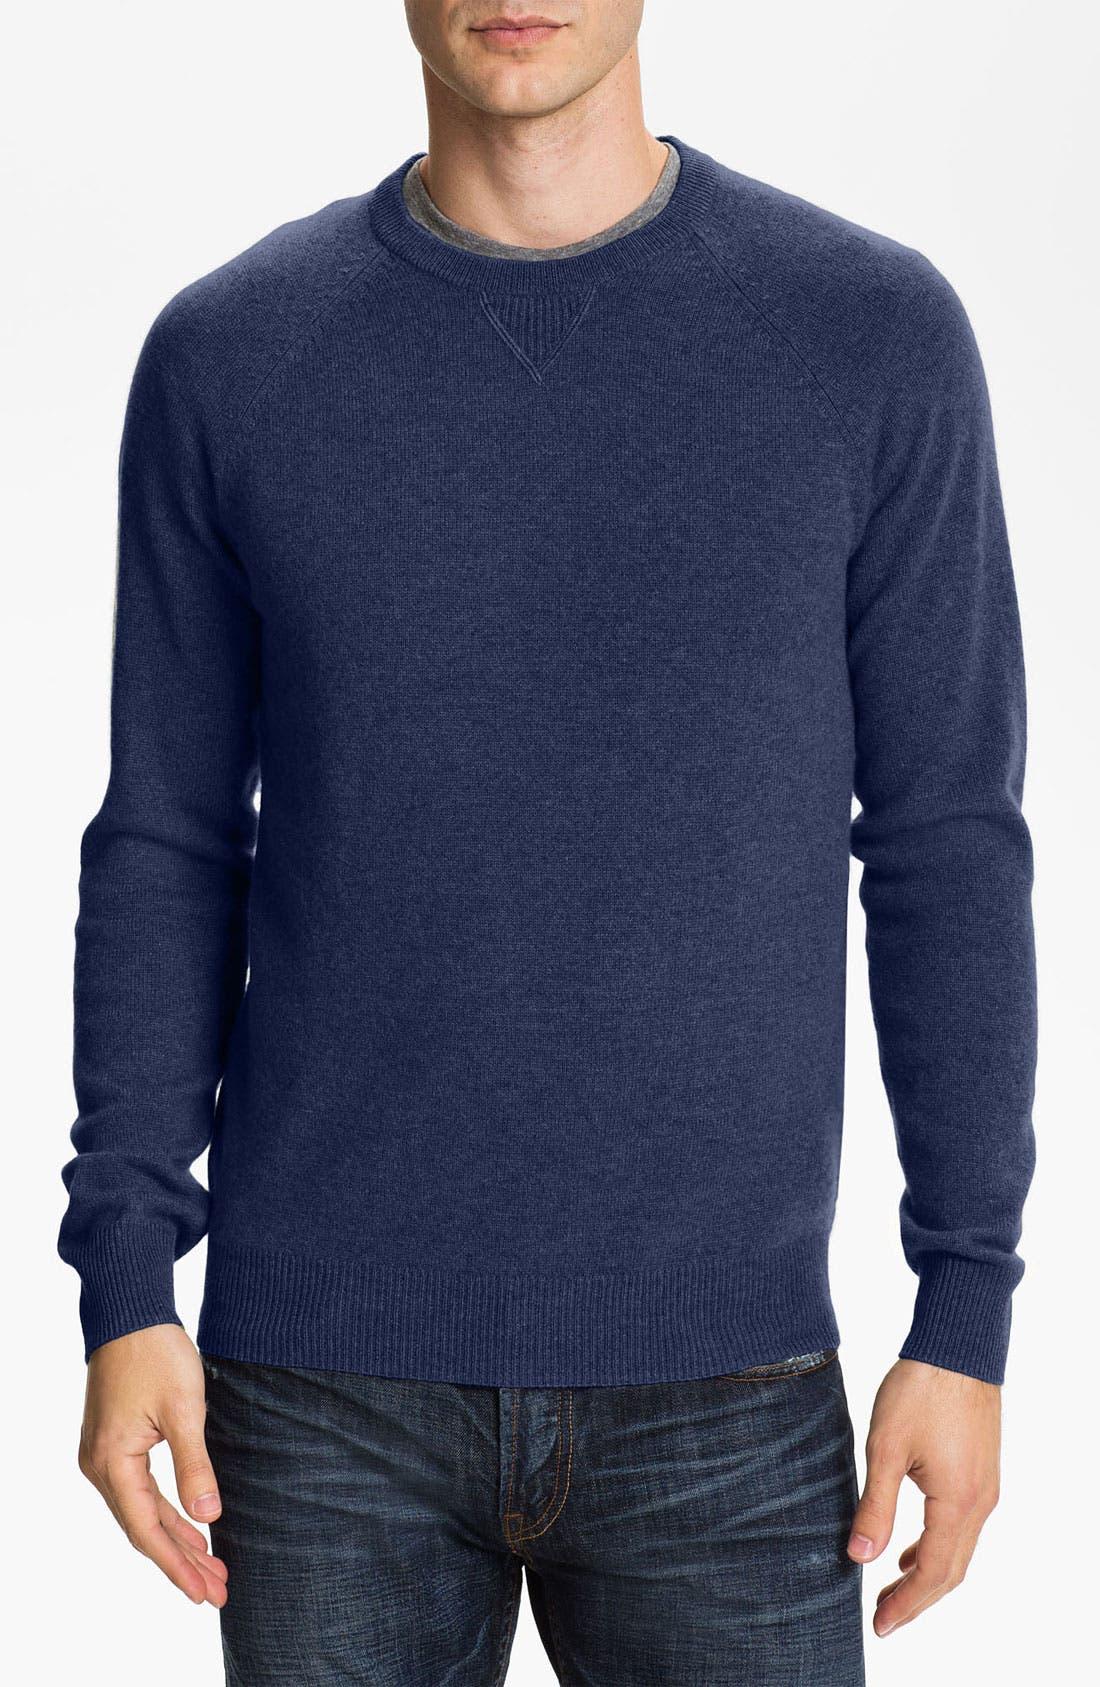 Alternate Image 1 Selected - 1901 Trim Fit Crewneck Cashmere Sweater